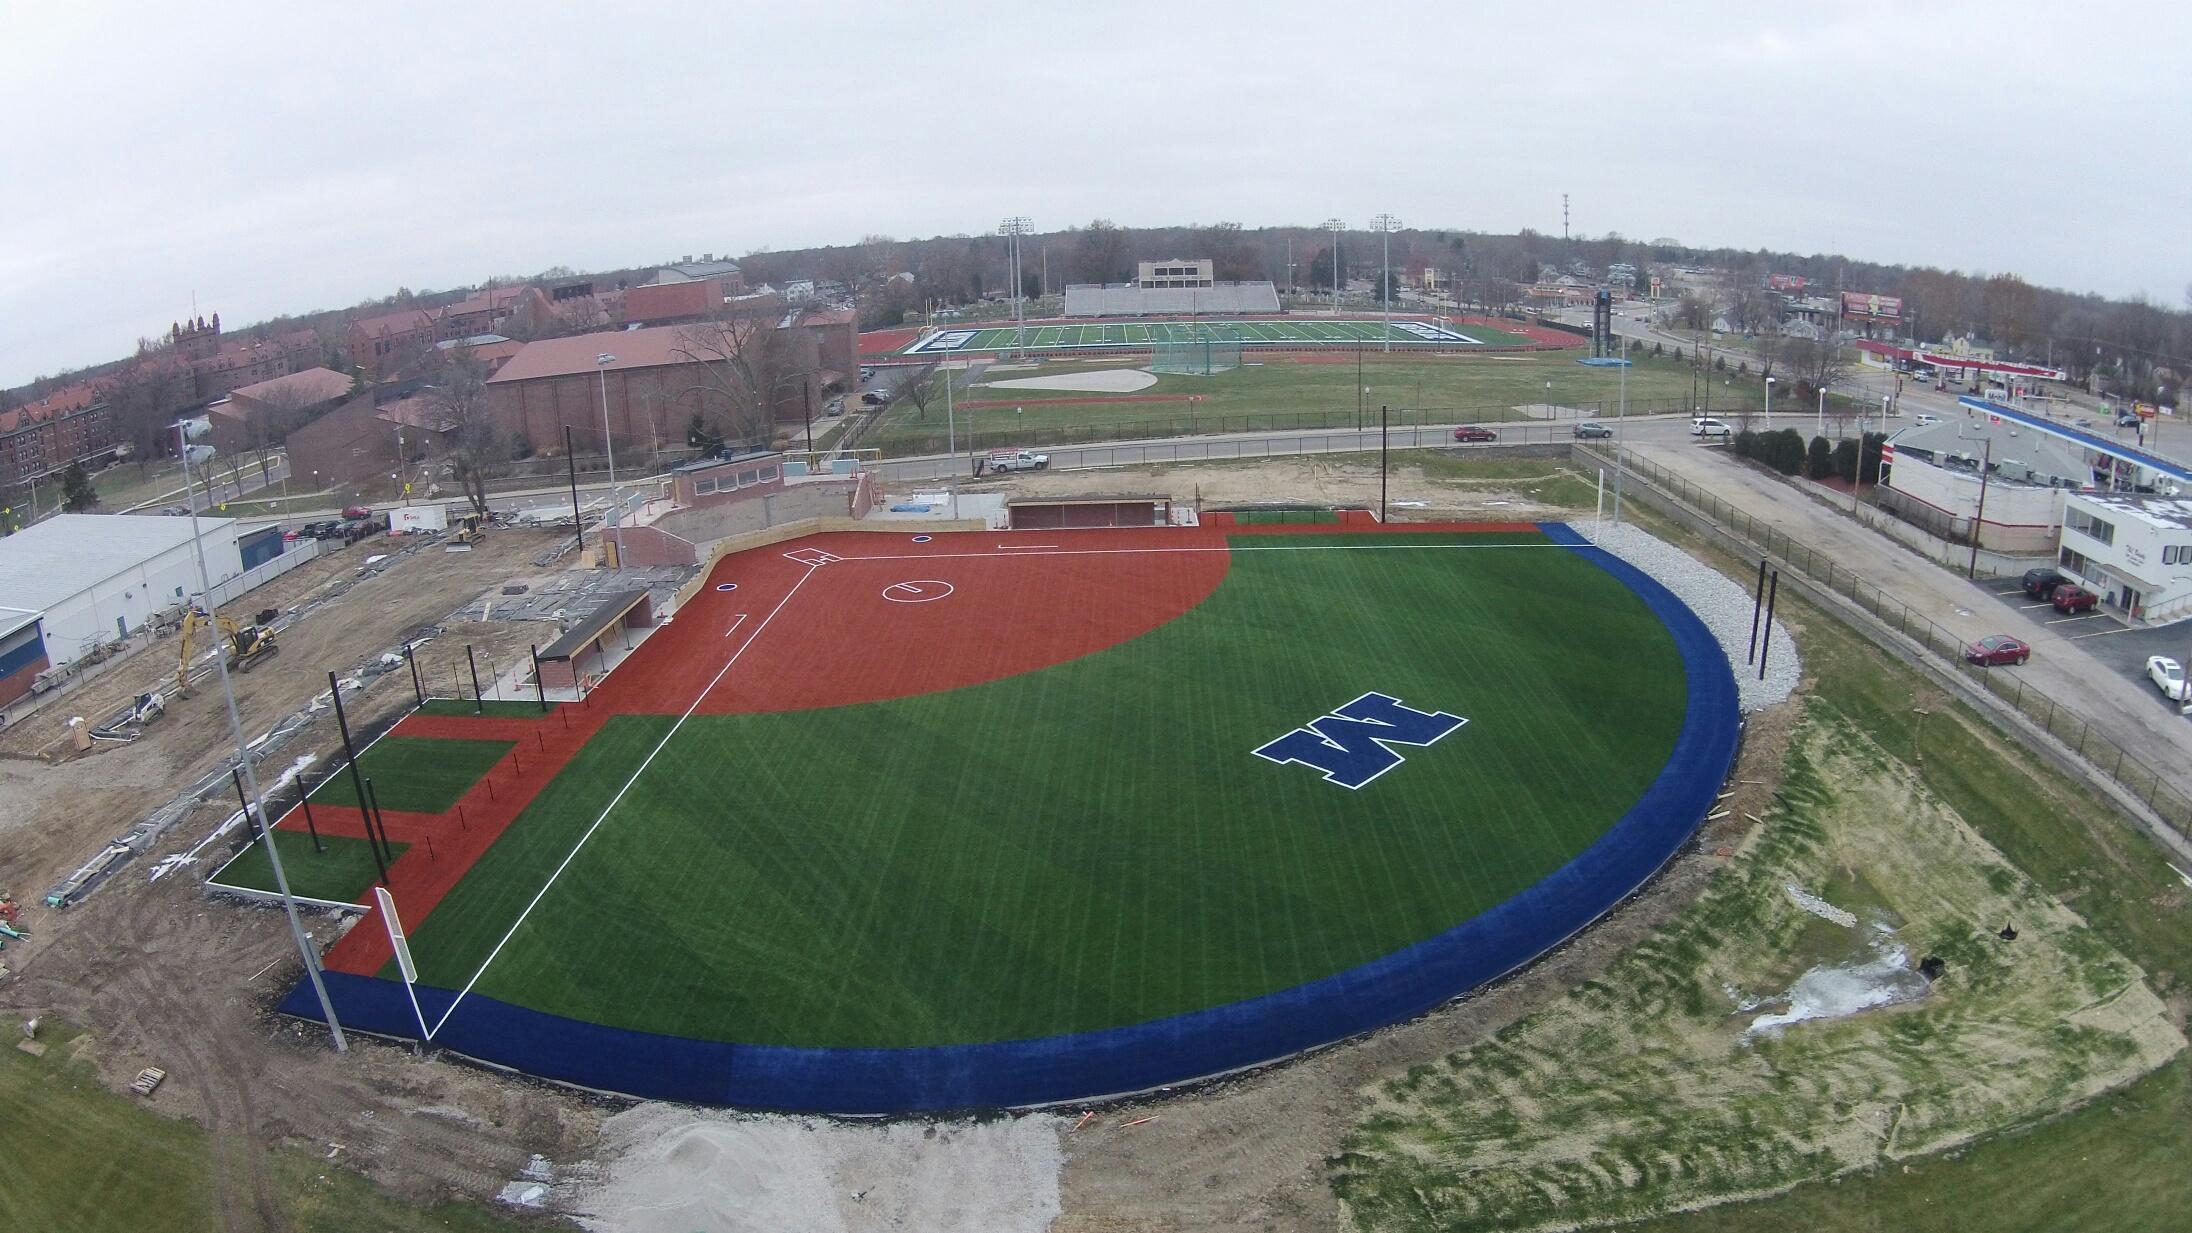 Millikin University Softball GreenFields The Green